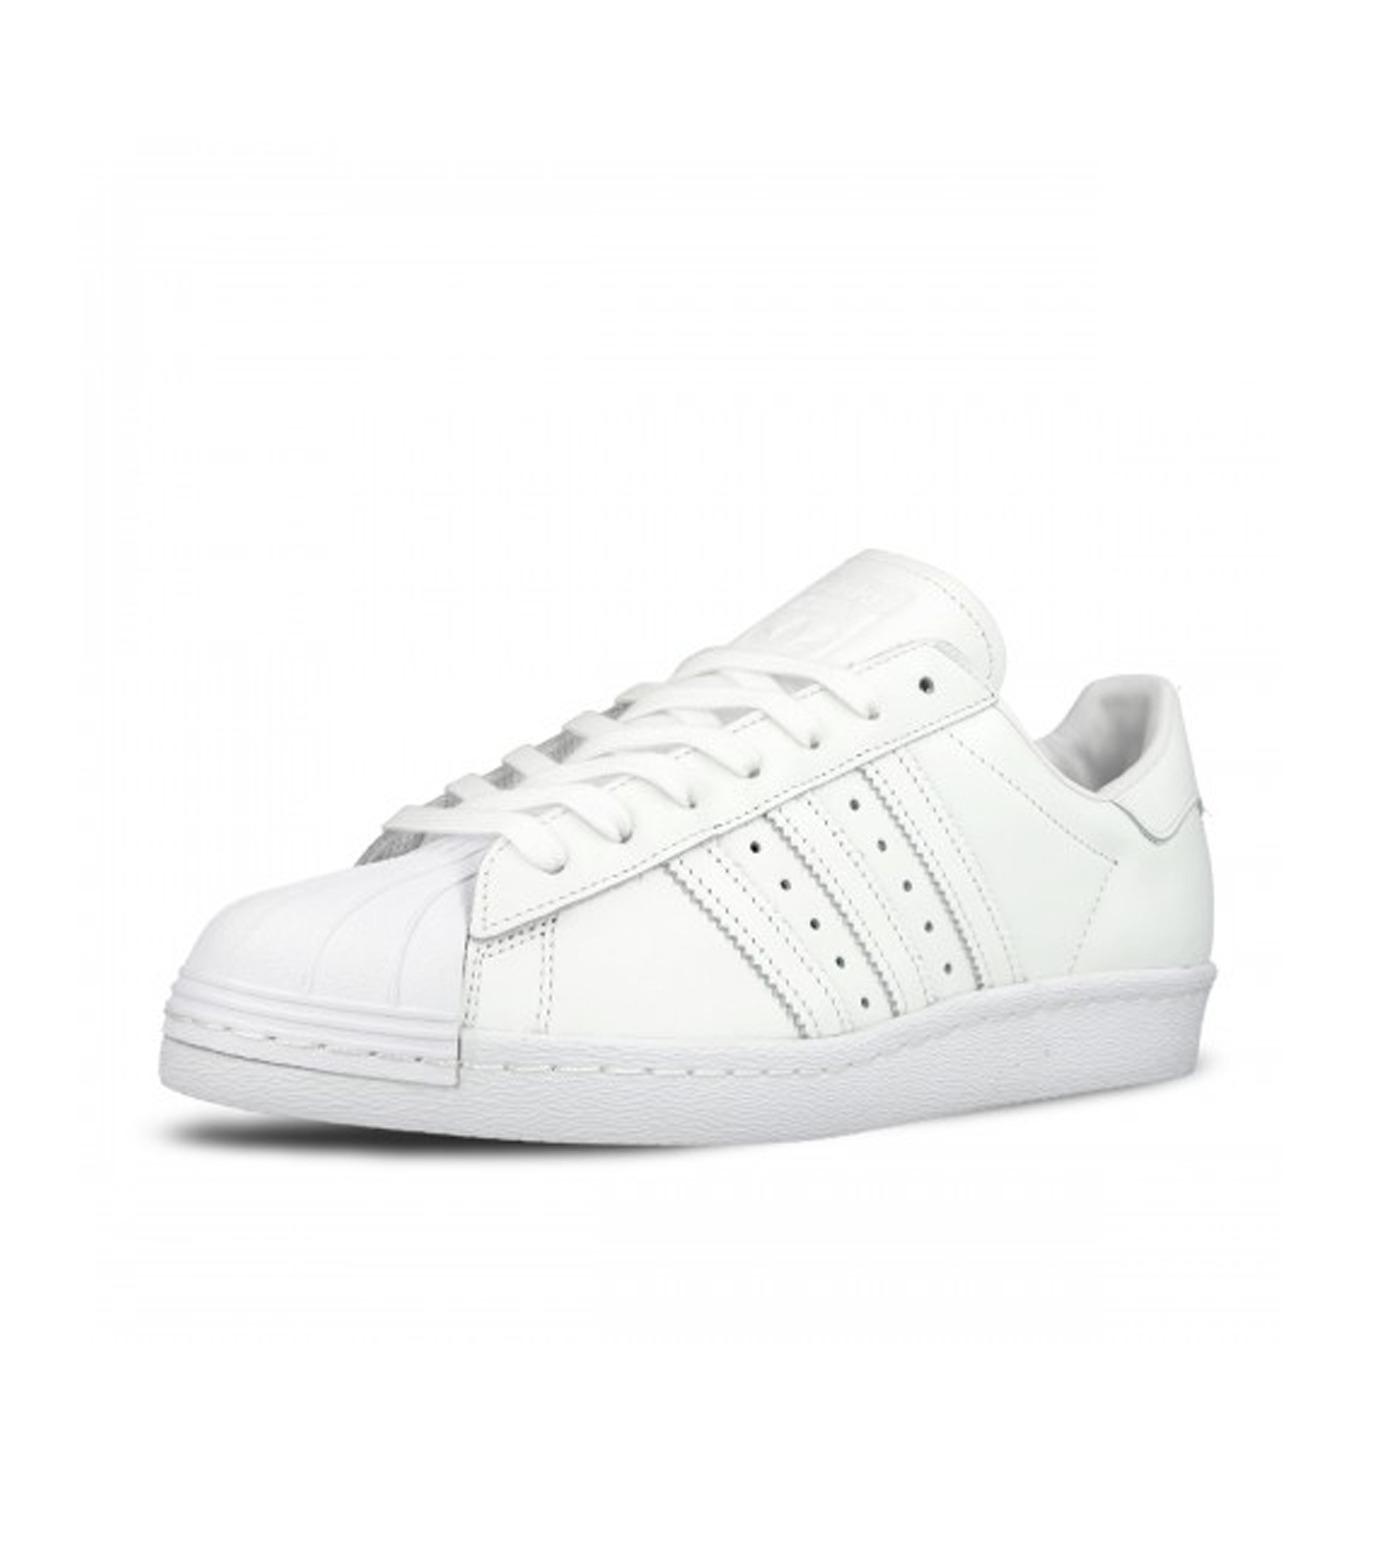 adidas(アディダス)のSUPERSTAR 80s-WHITE(シューズ/shoes)-S79443-4 拡大詳細画像4